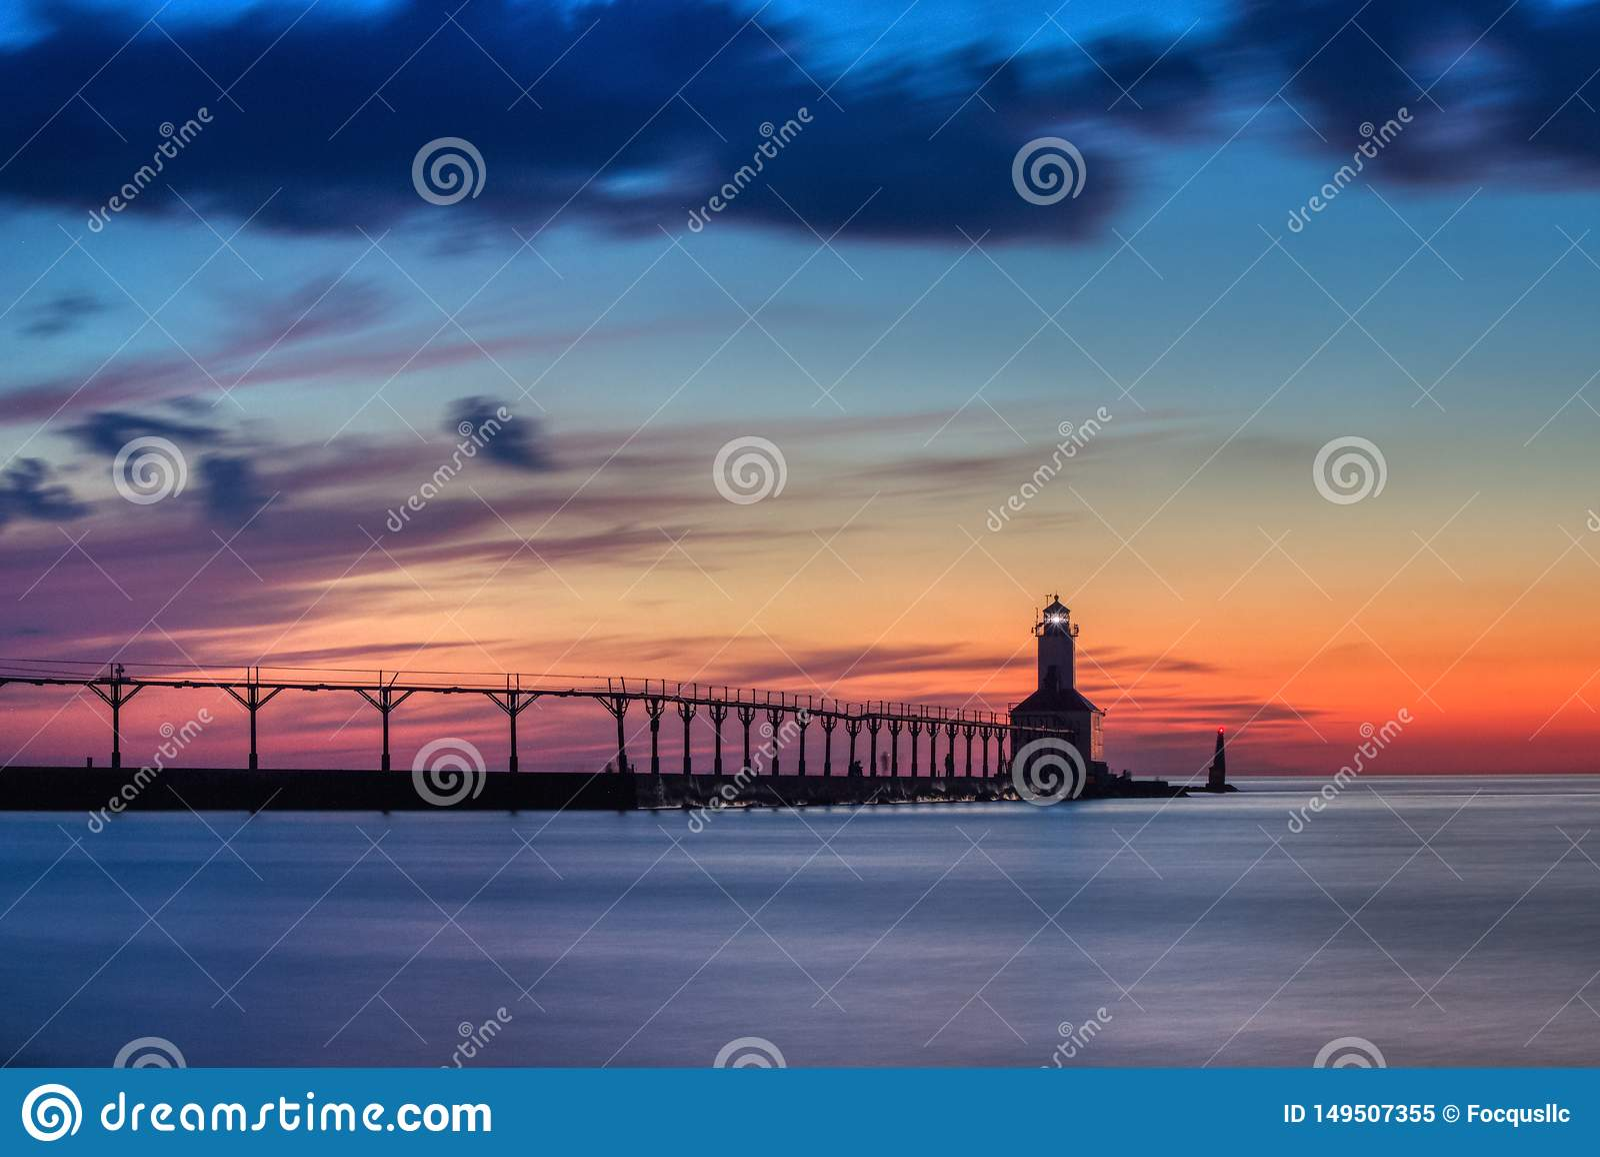 Michigan City East Pierhead Lighthouse After Sunset